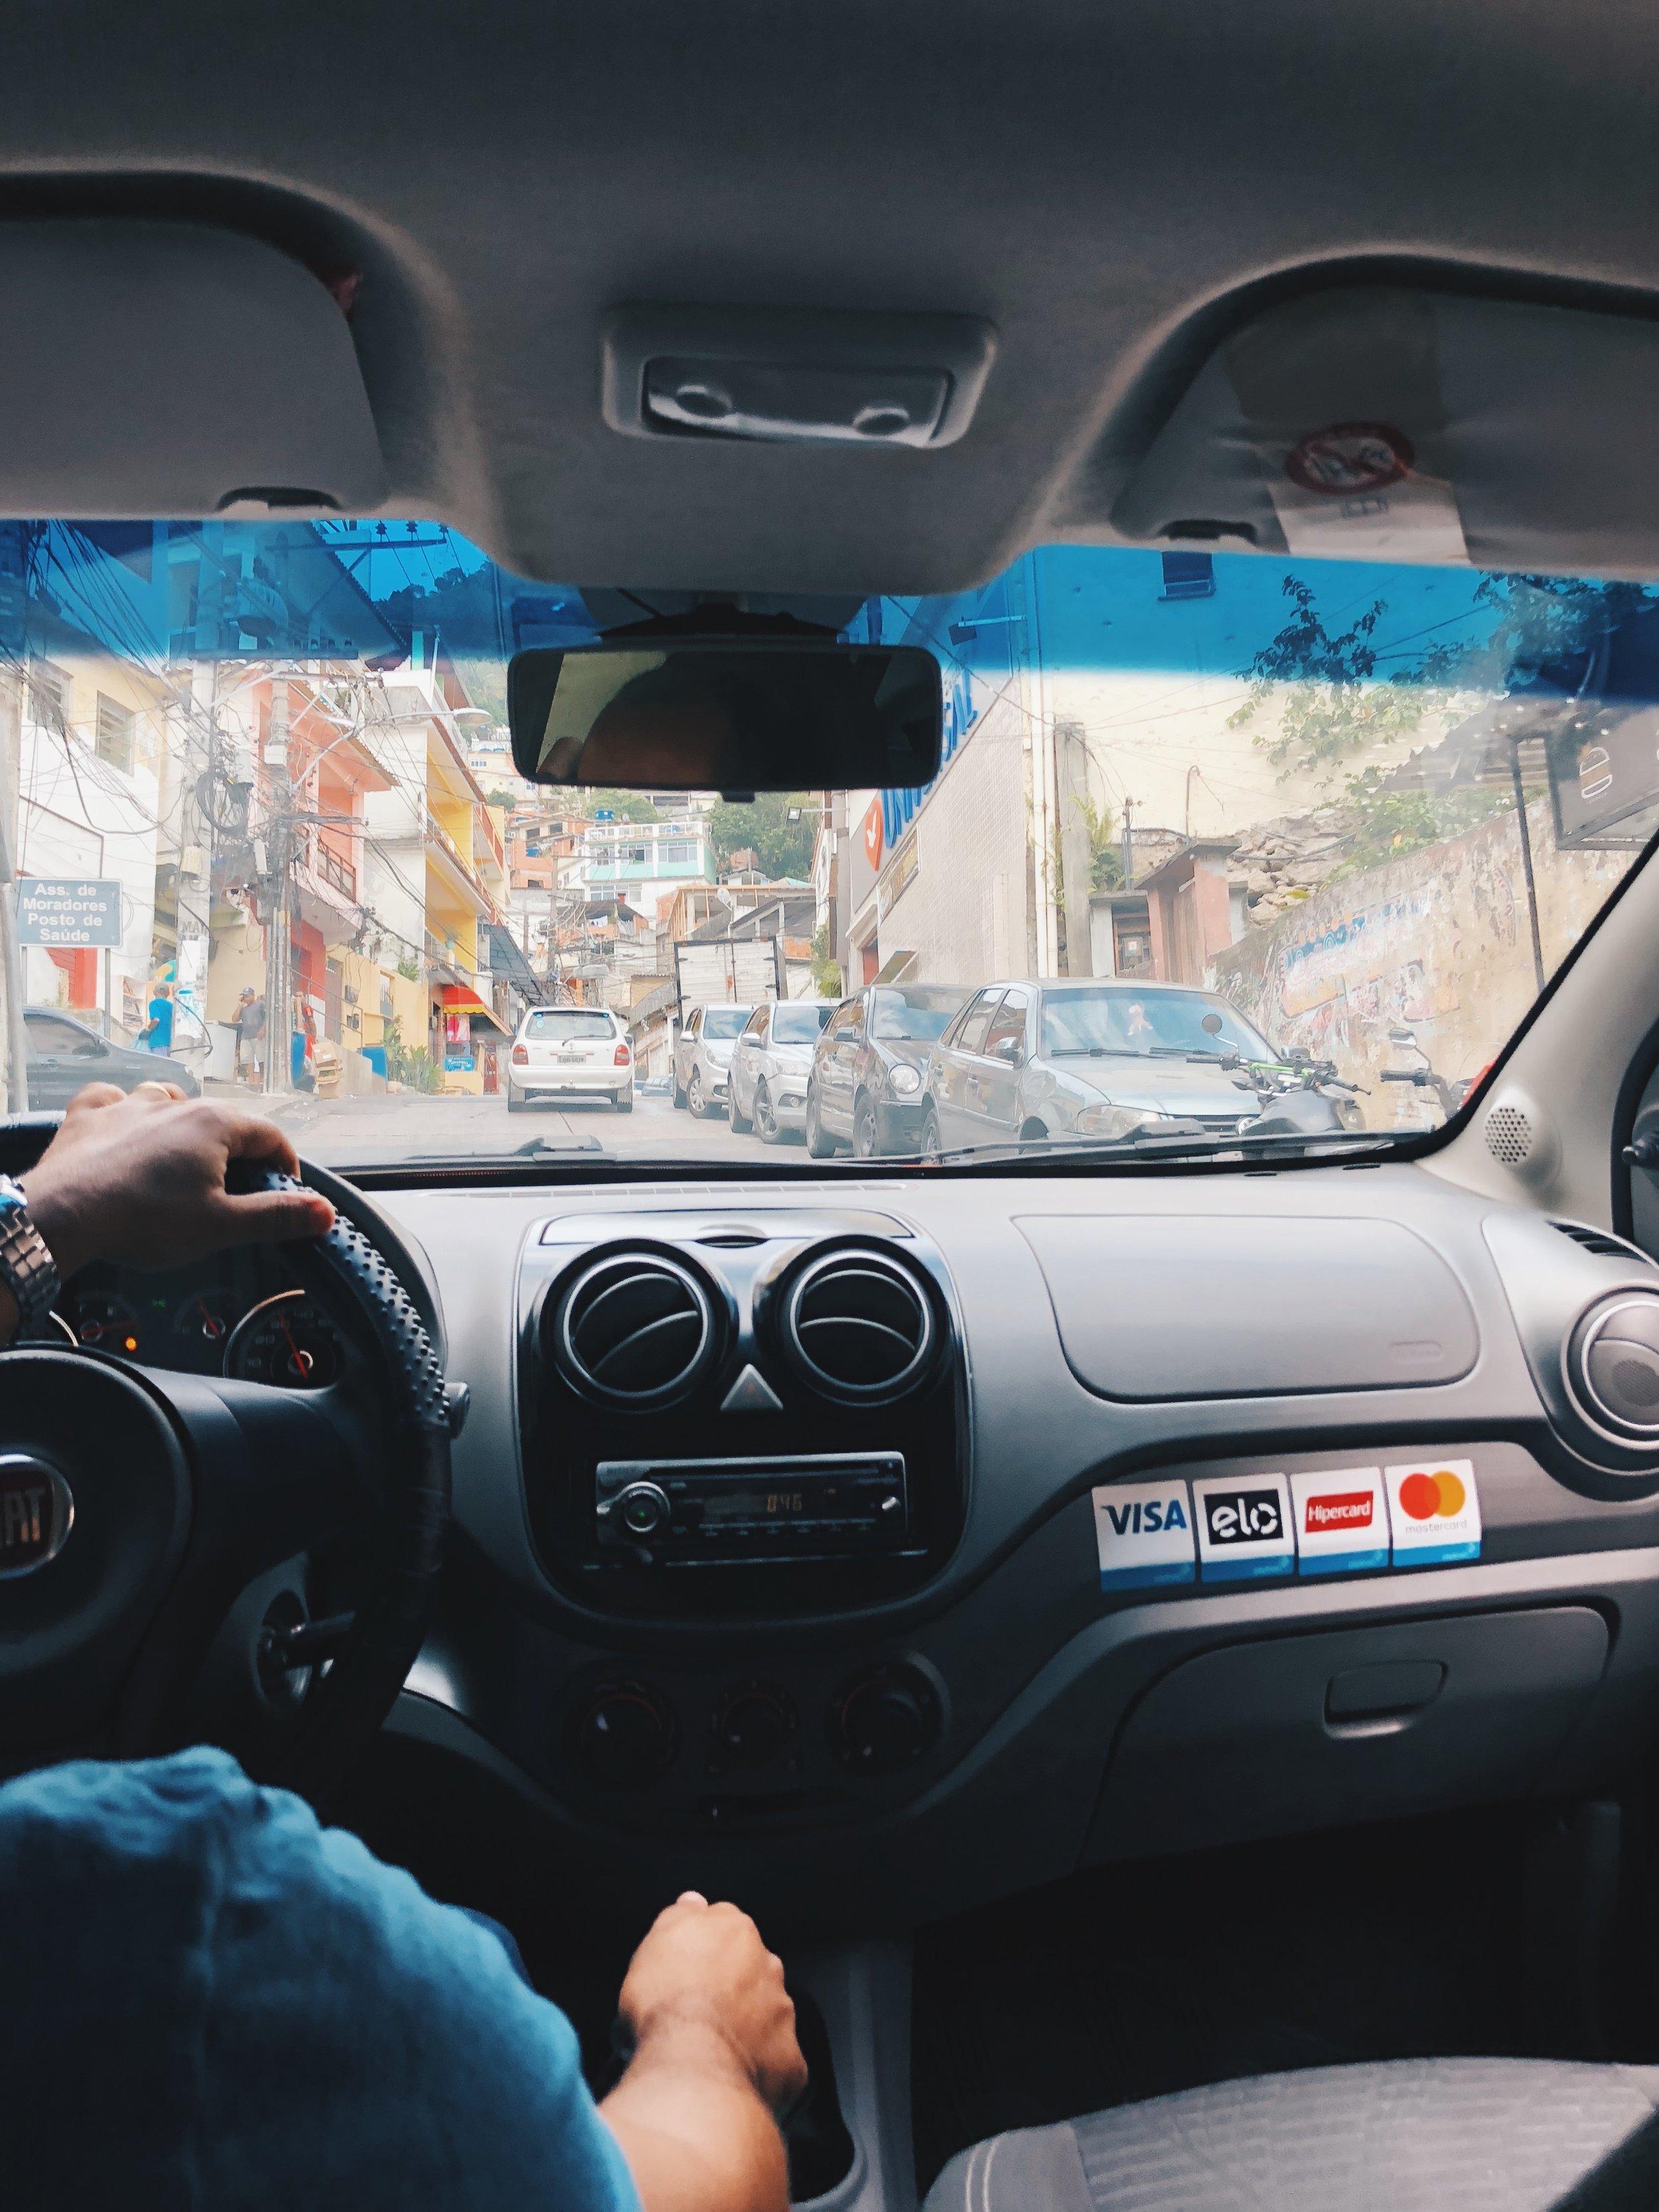 Uber ride to the Morro Dois Irmãos trial head